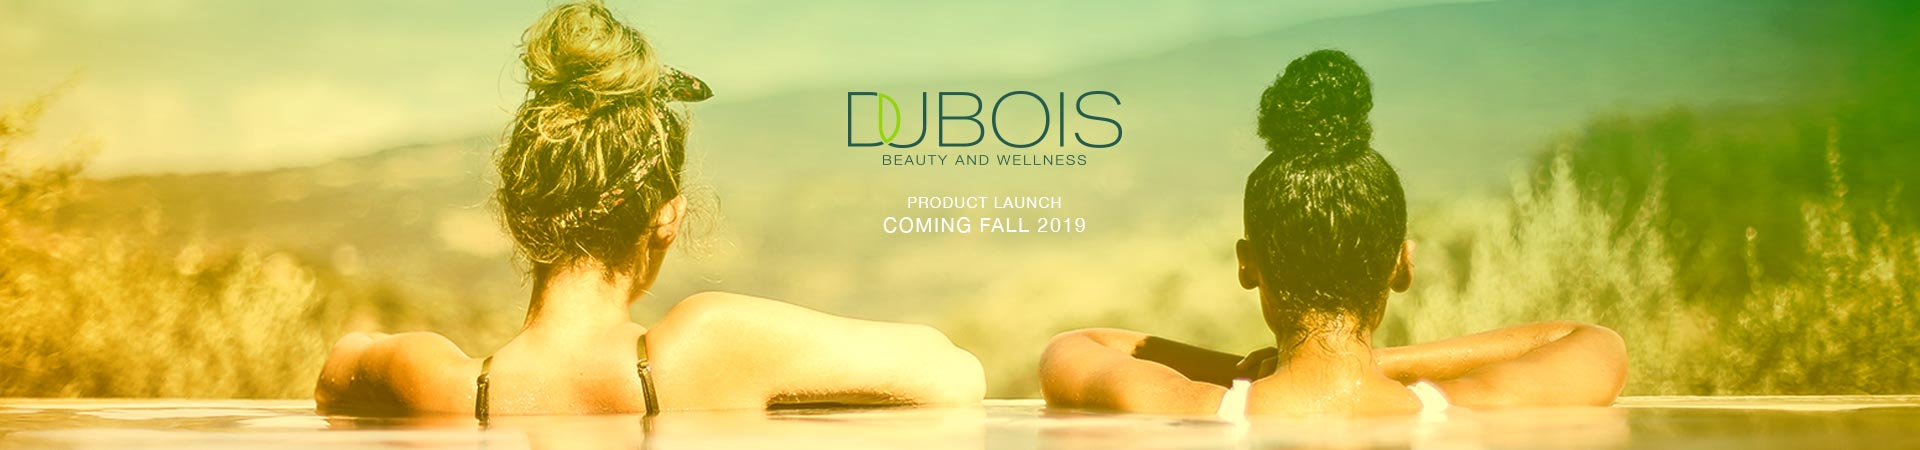 Dubois Beauty & Wellness Skincare Products